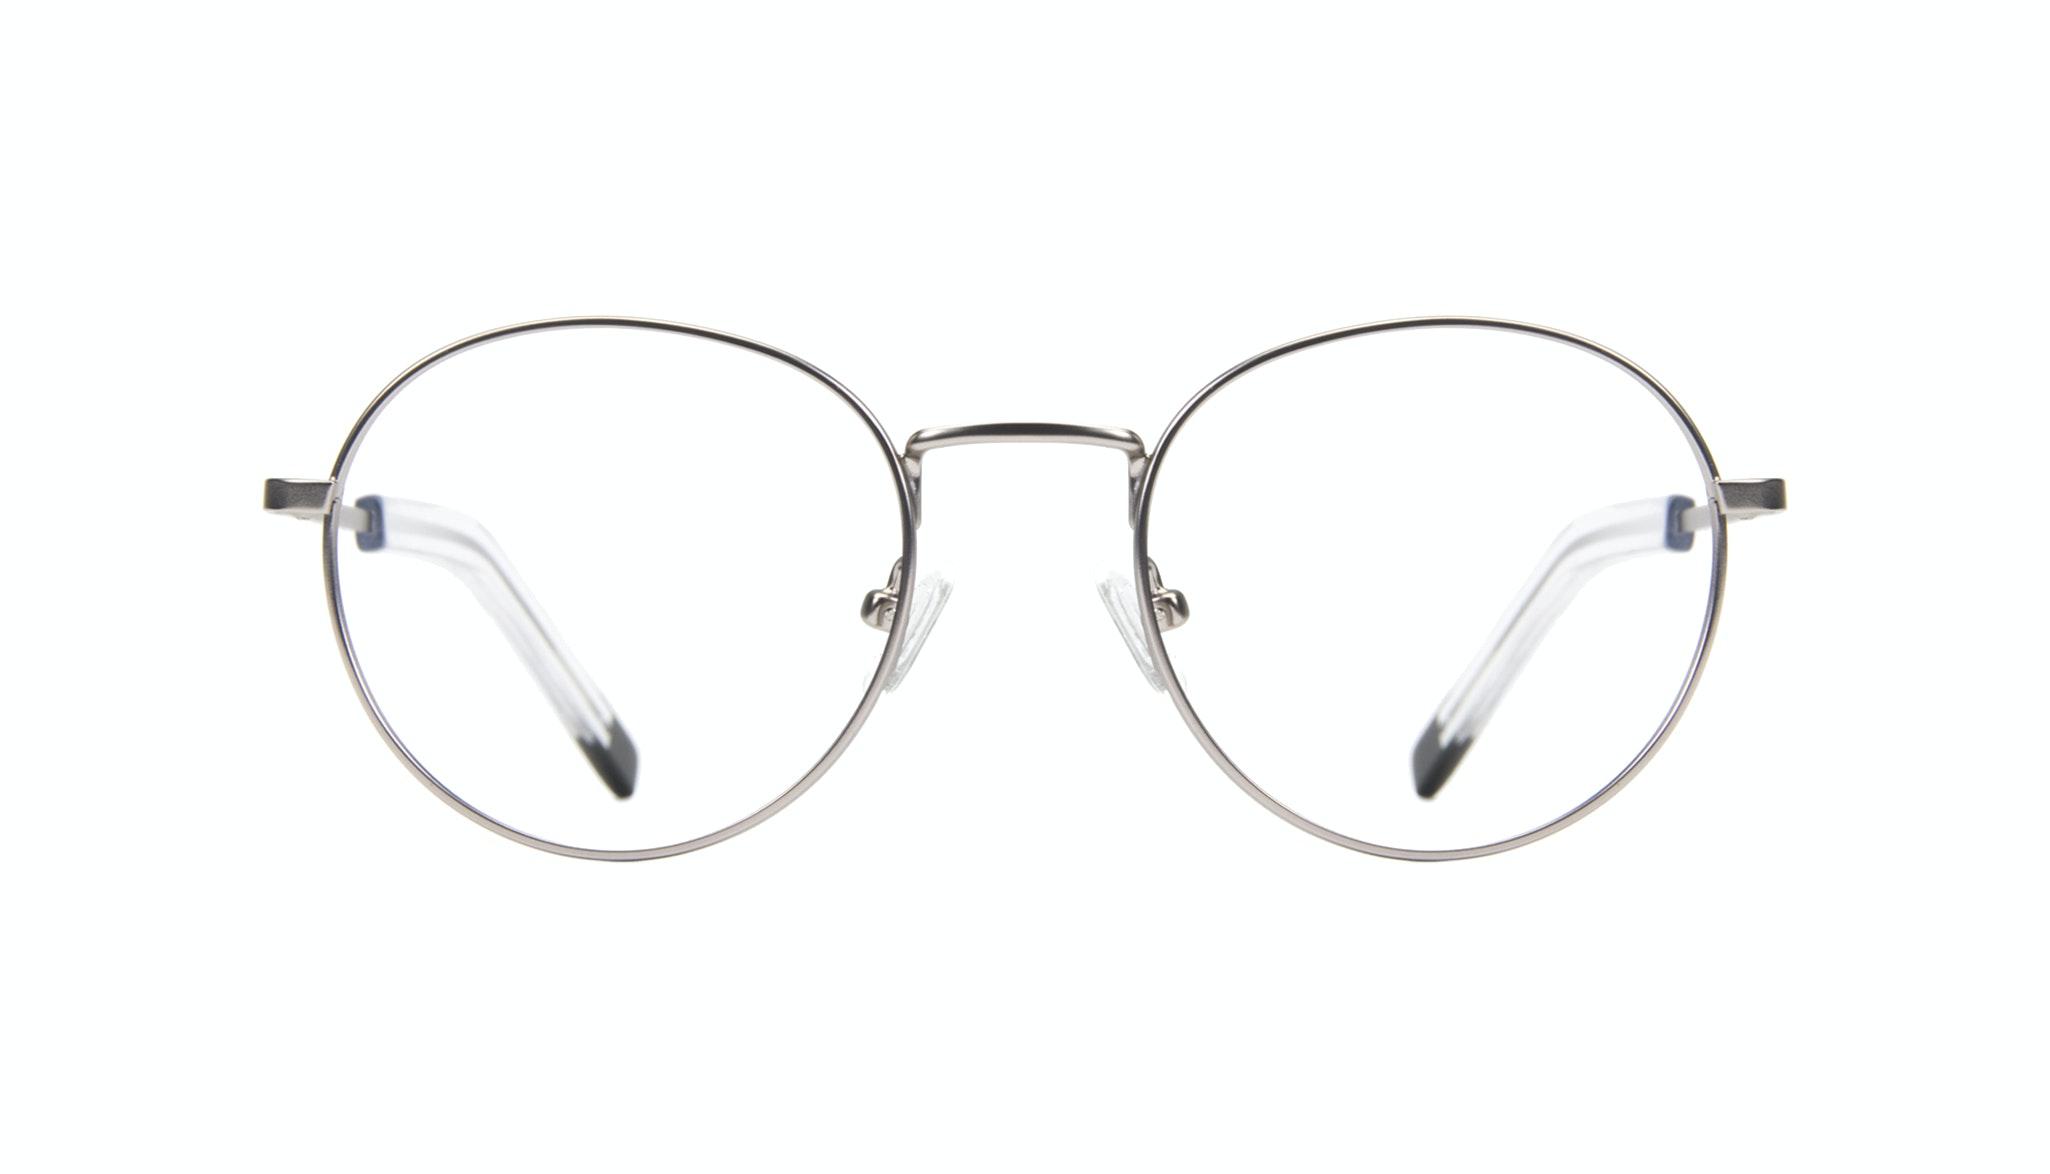 Affordable Fashion Glasses Round Eyeglasses Men Lean Steel Front